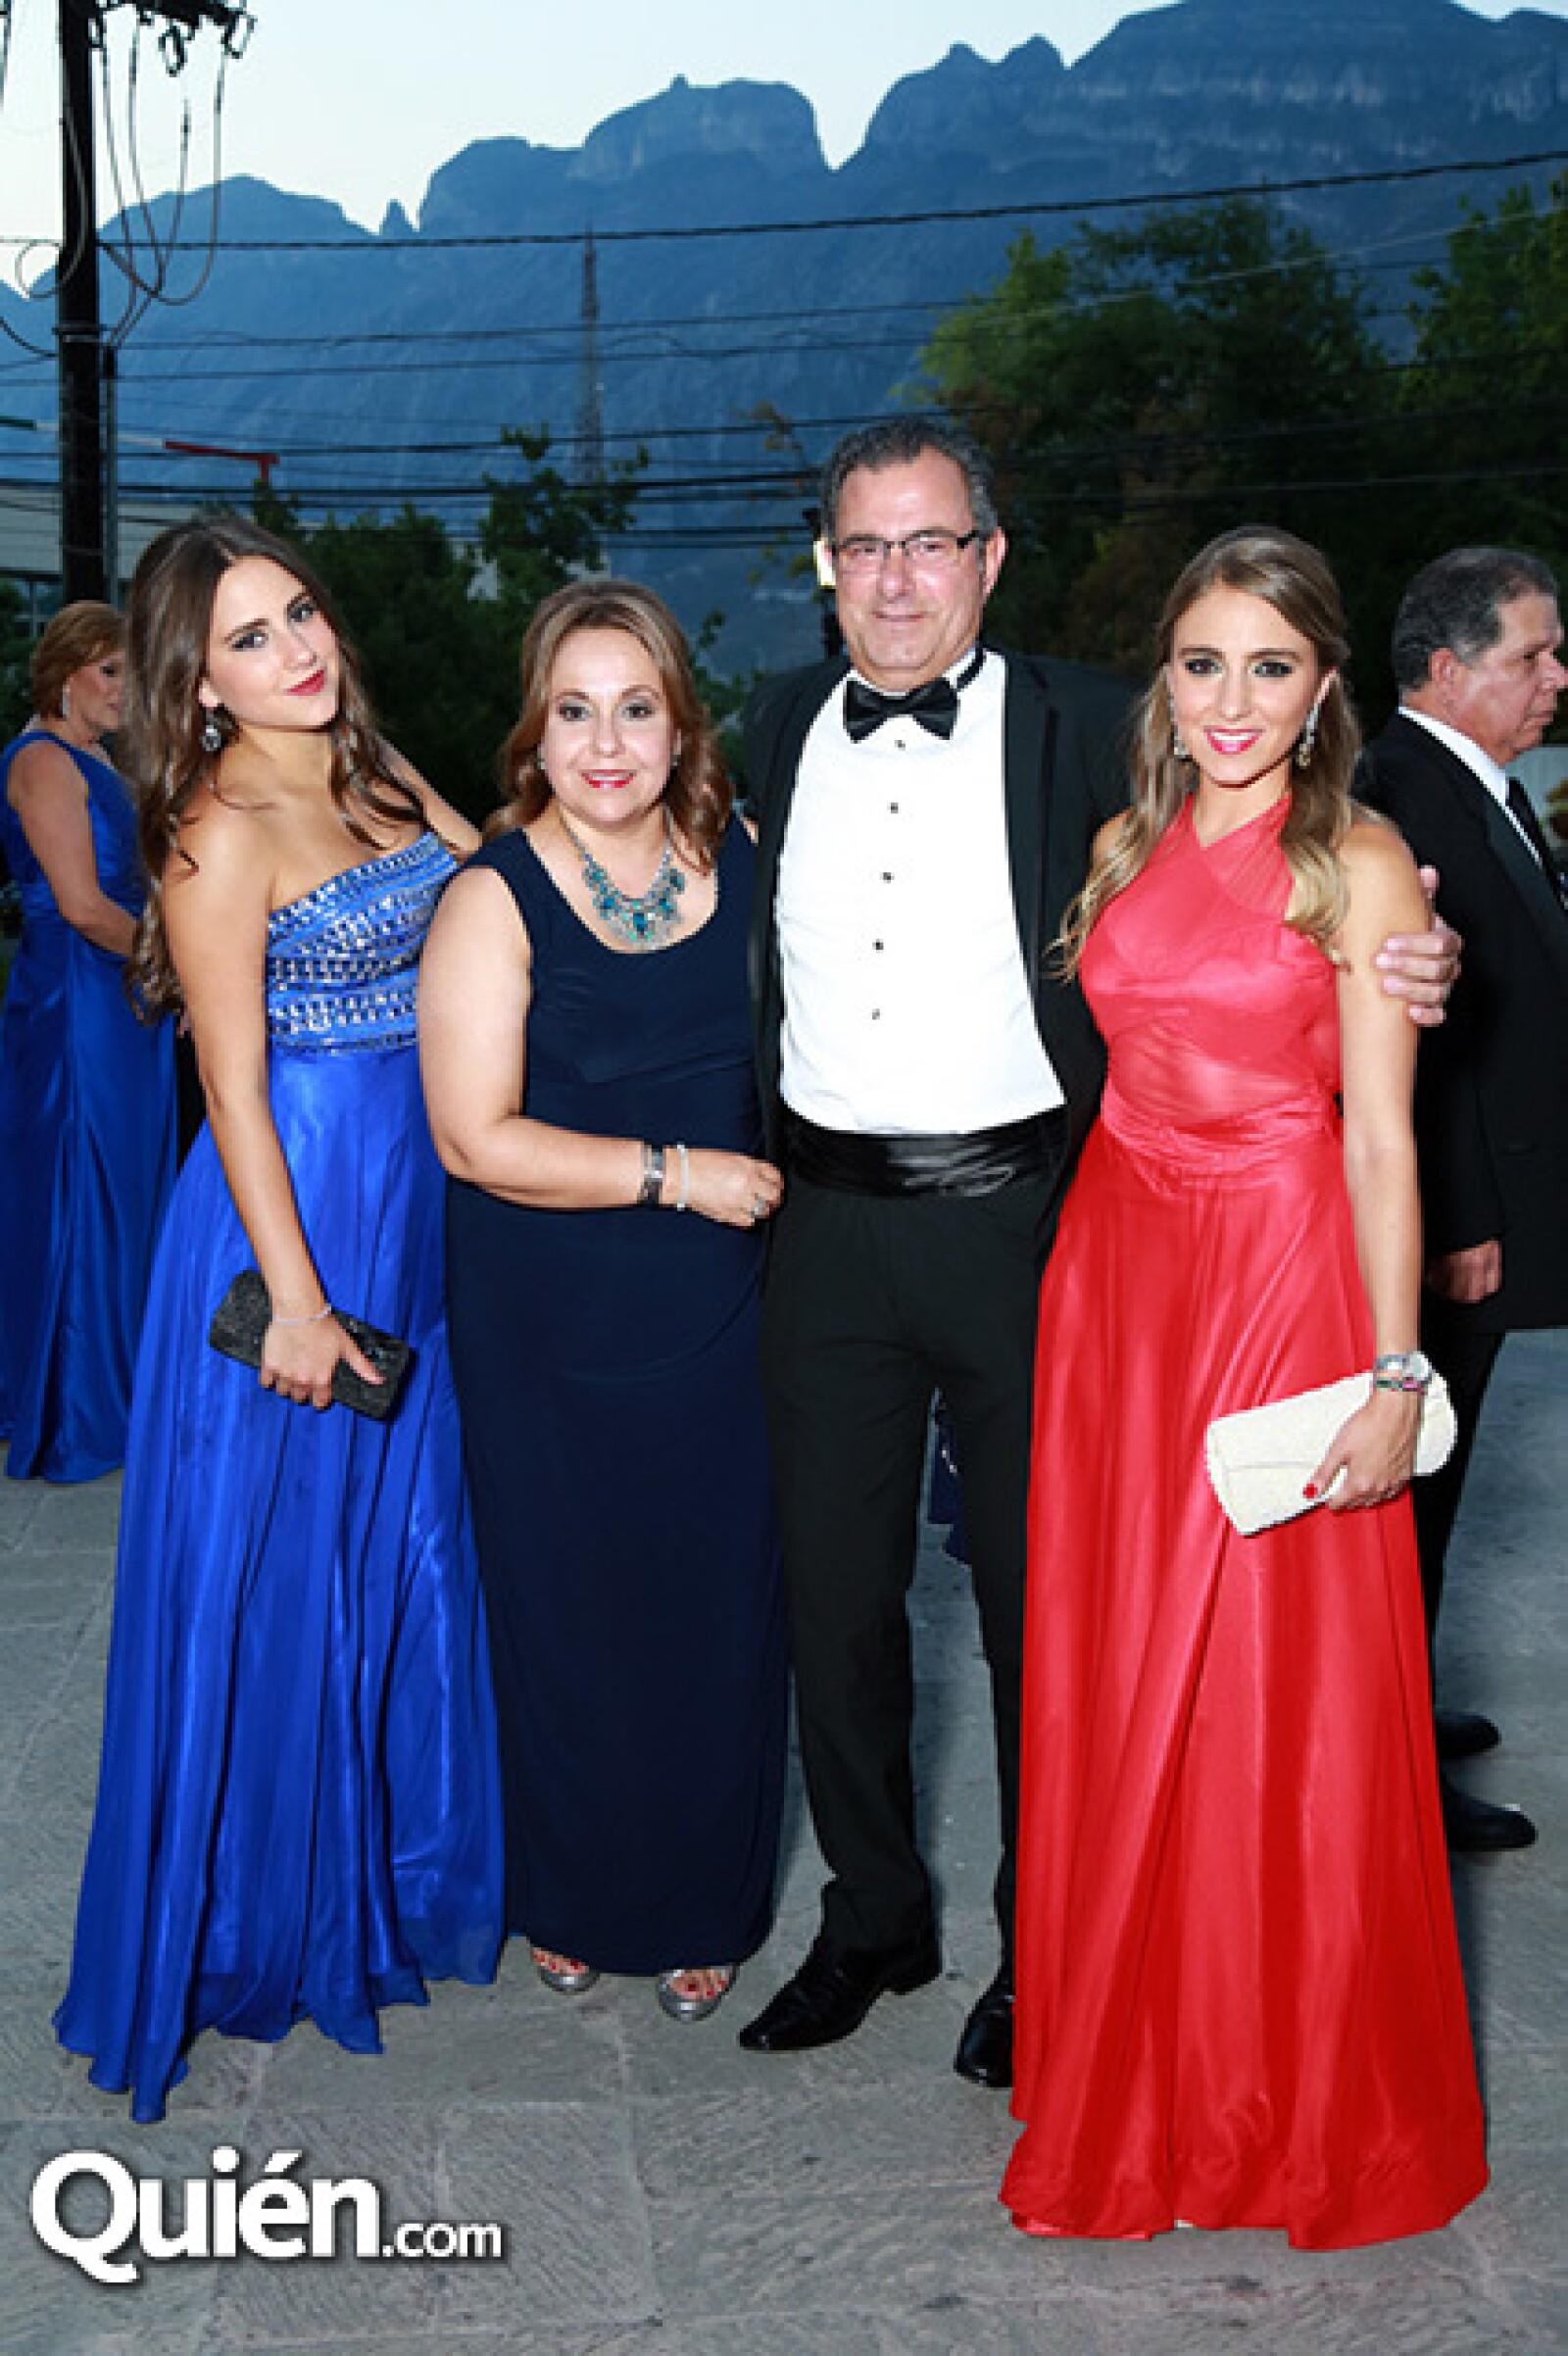 Luisa Bracho,Mónica Bracho,Jorge Bracho y Arantza Bracho.